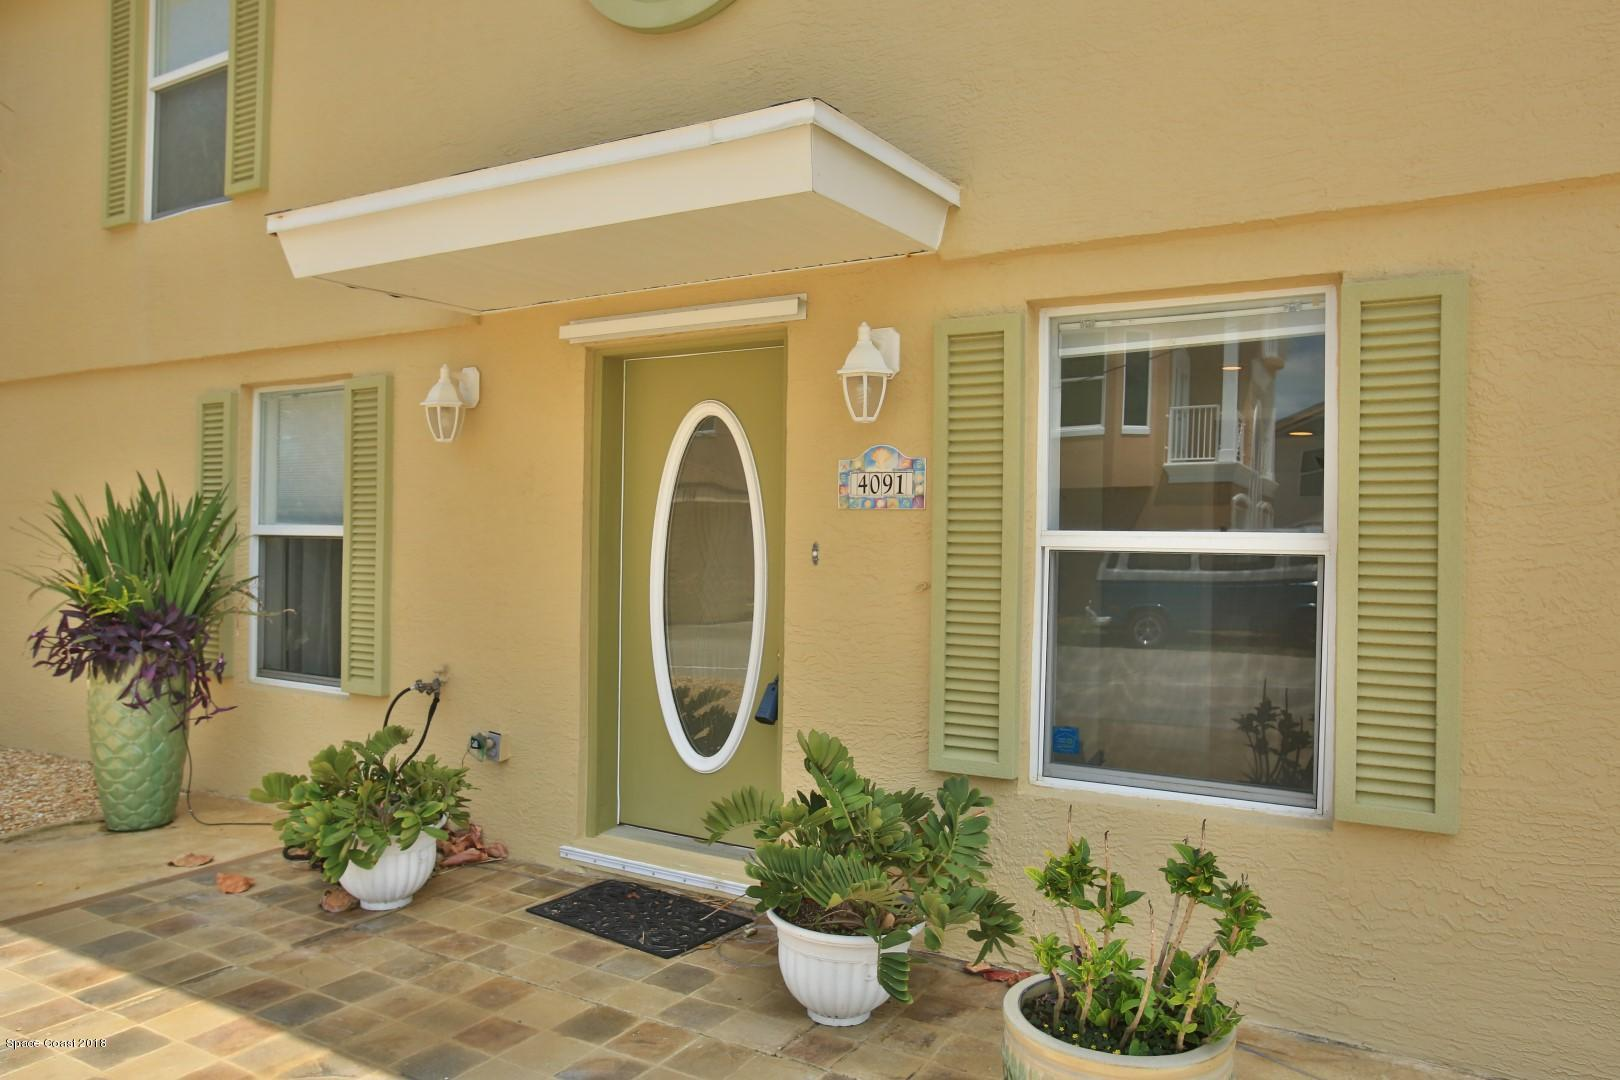 4091-Hill-New-Smyrna-Beach-FL-32169